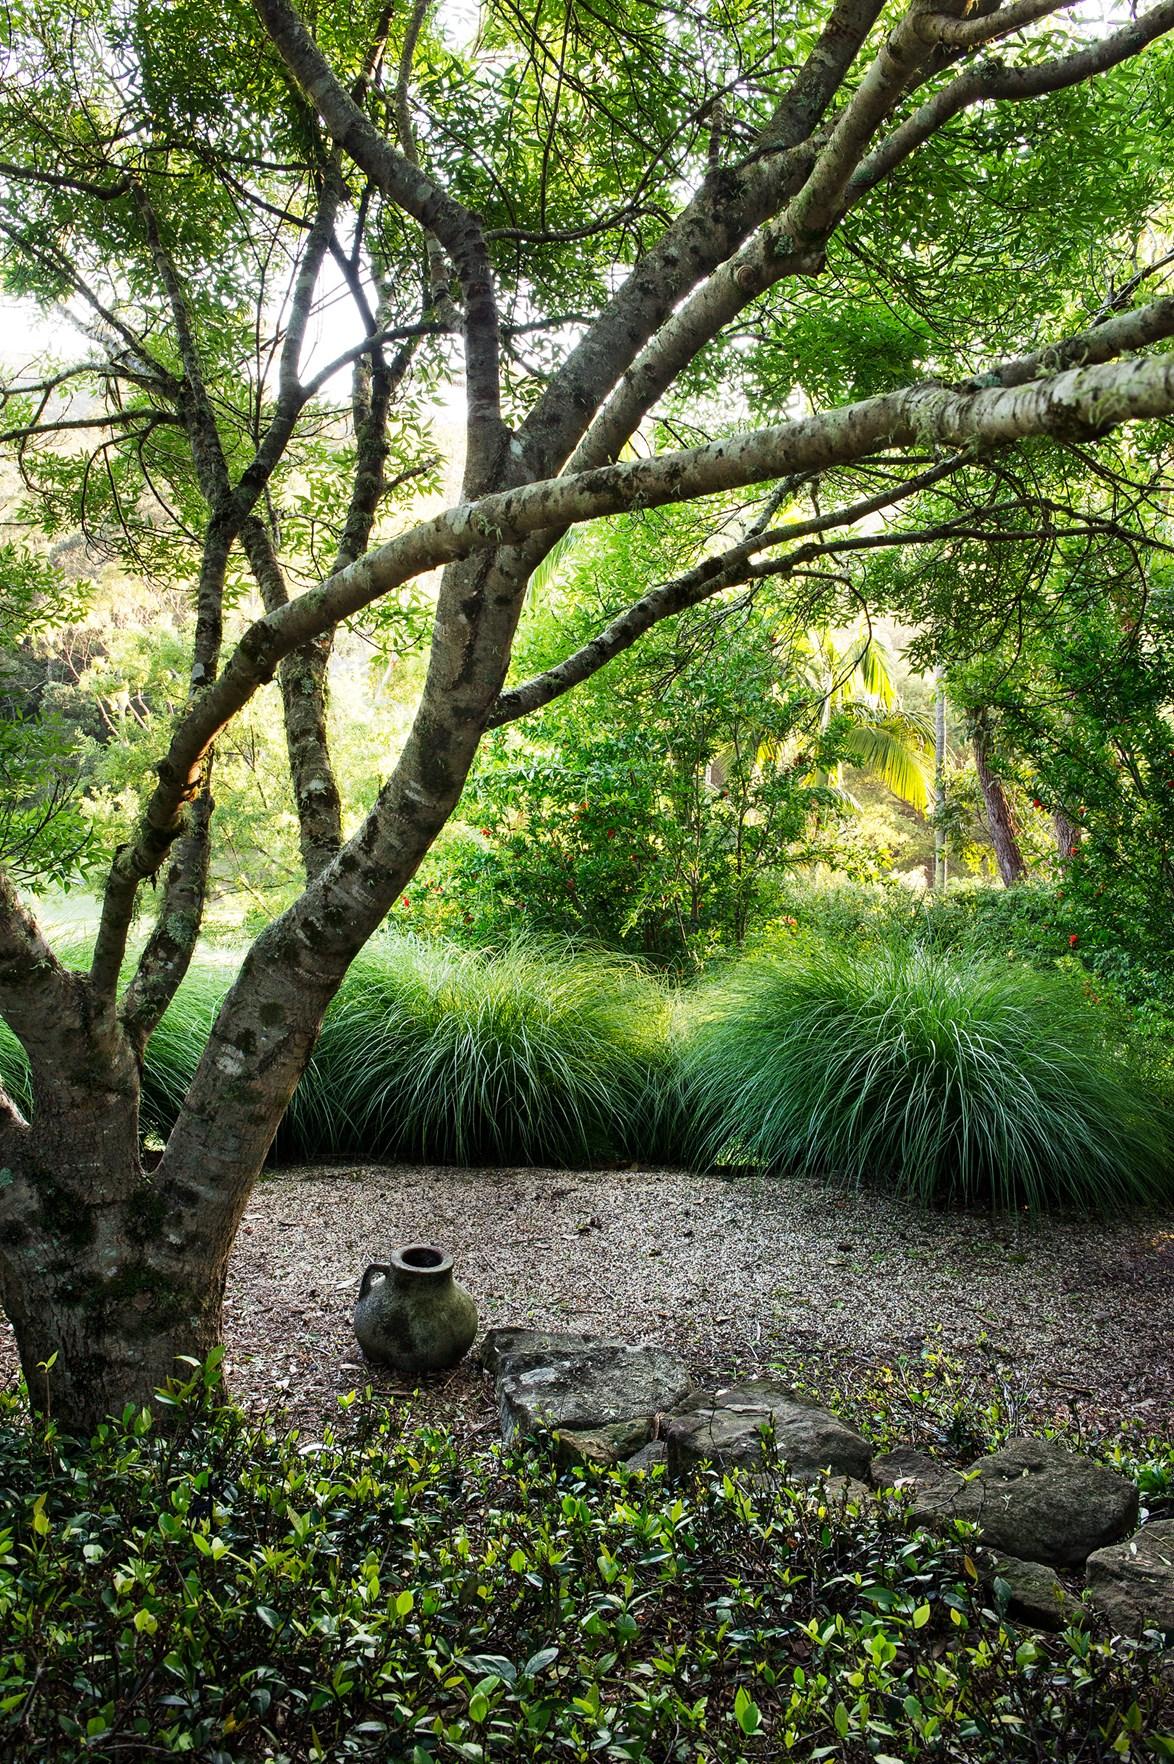 The claret ash has become one of Sydney's favourite deciduous street trees. *Photo:* Brigid Arnott